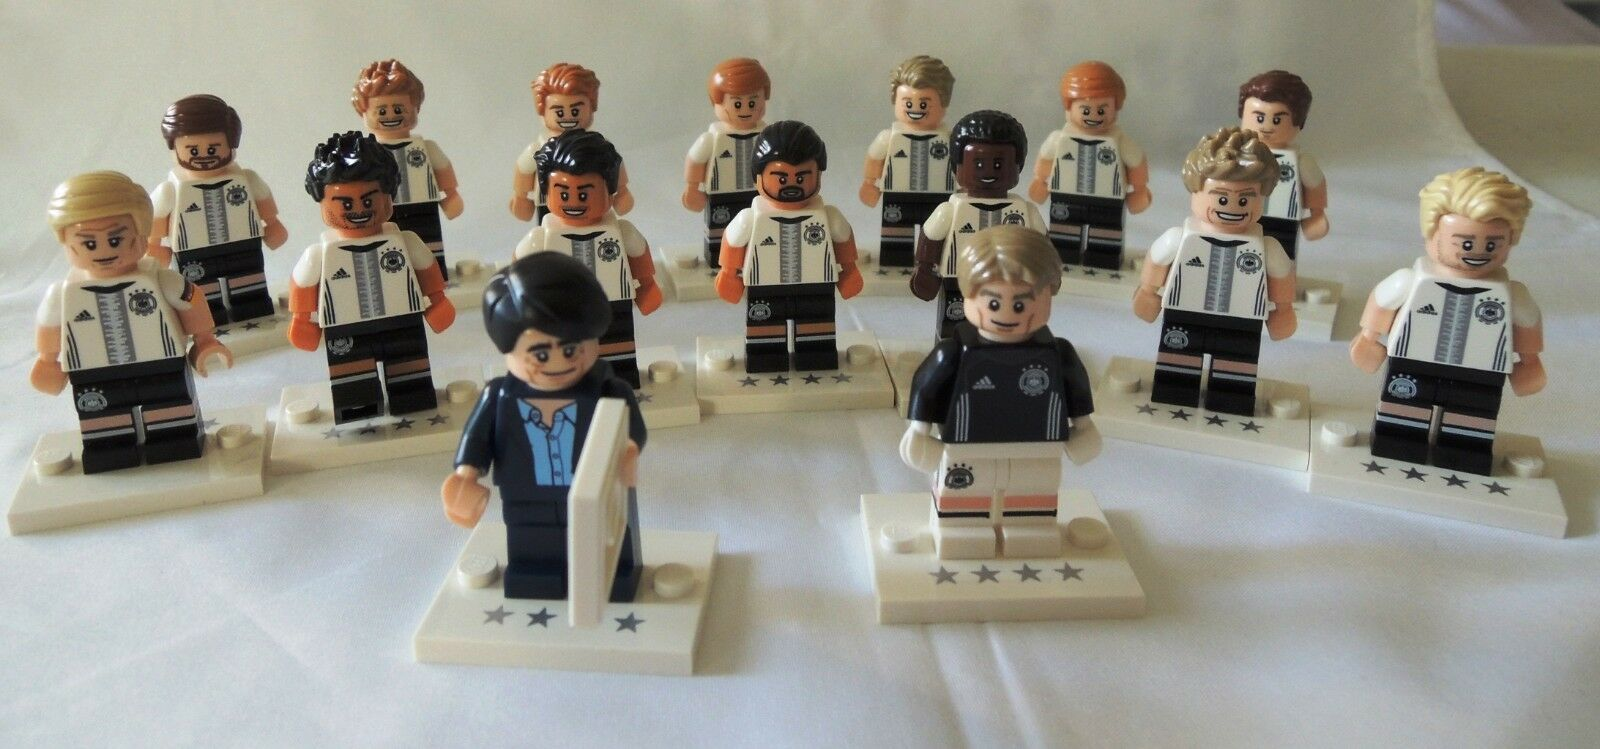 LEGO 71014 Complete Set of 16 DFB (German Soccer Team) MINIFIGURES SERIES